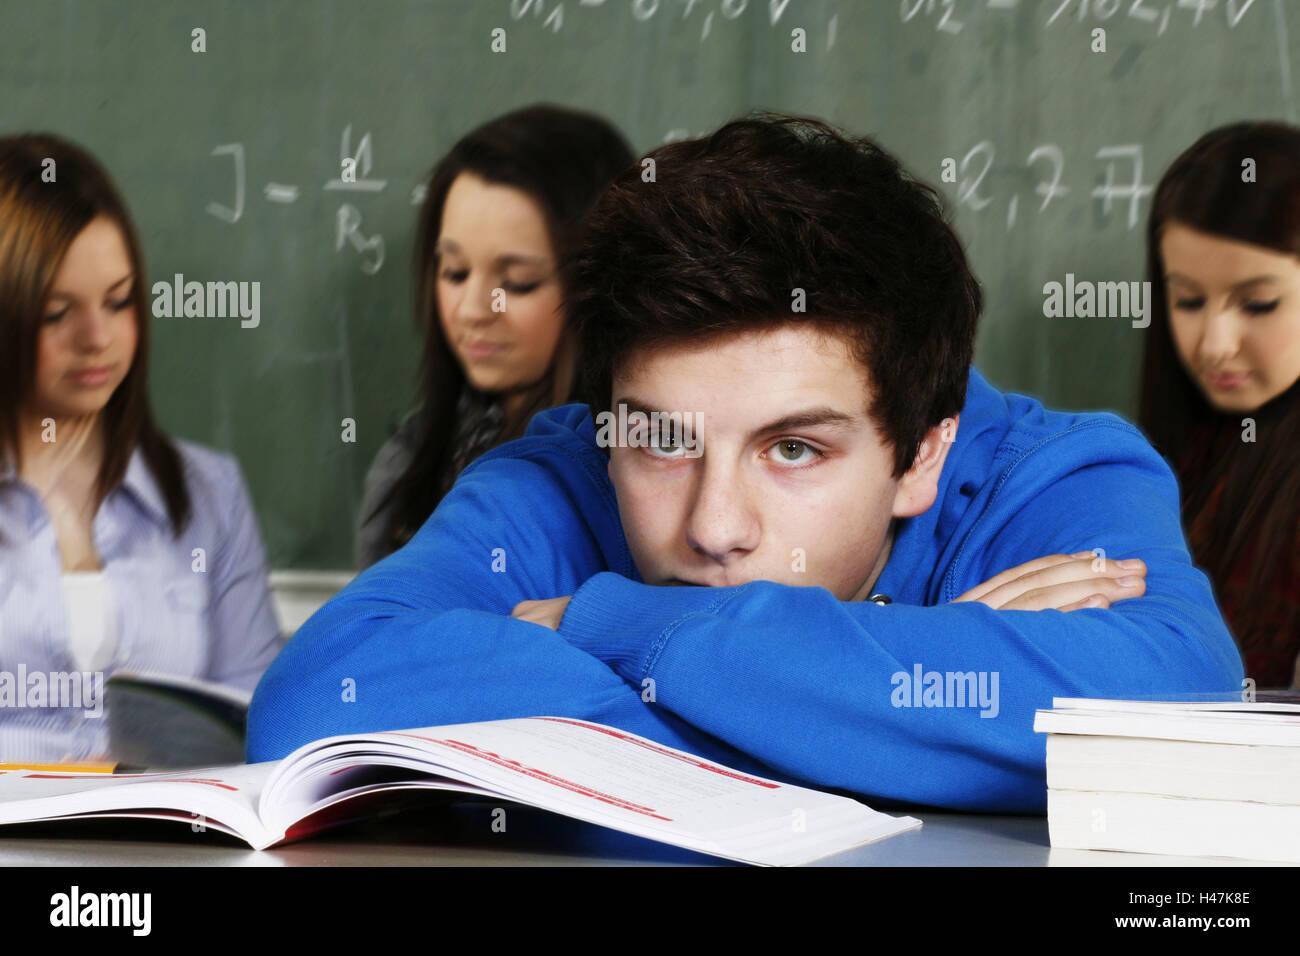 School, classroom, schoolboys, schoolgirls, blackboard, sitting, resting, head, view, boredom, concentration, books, - Stock Image